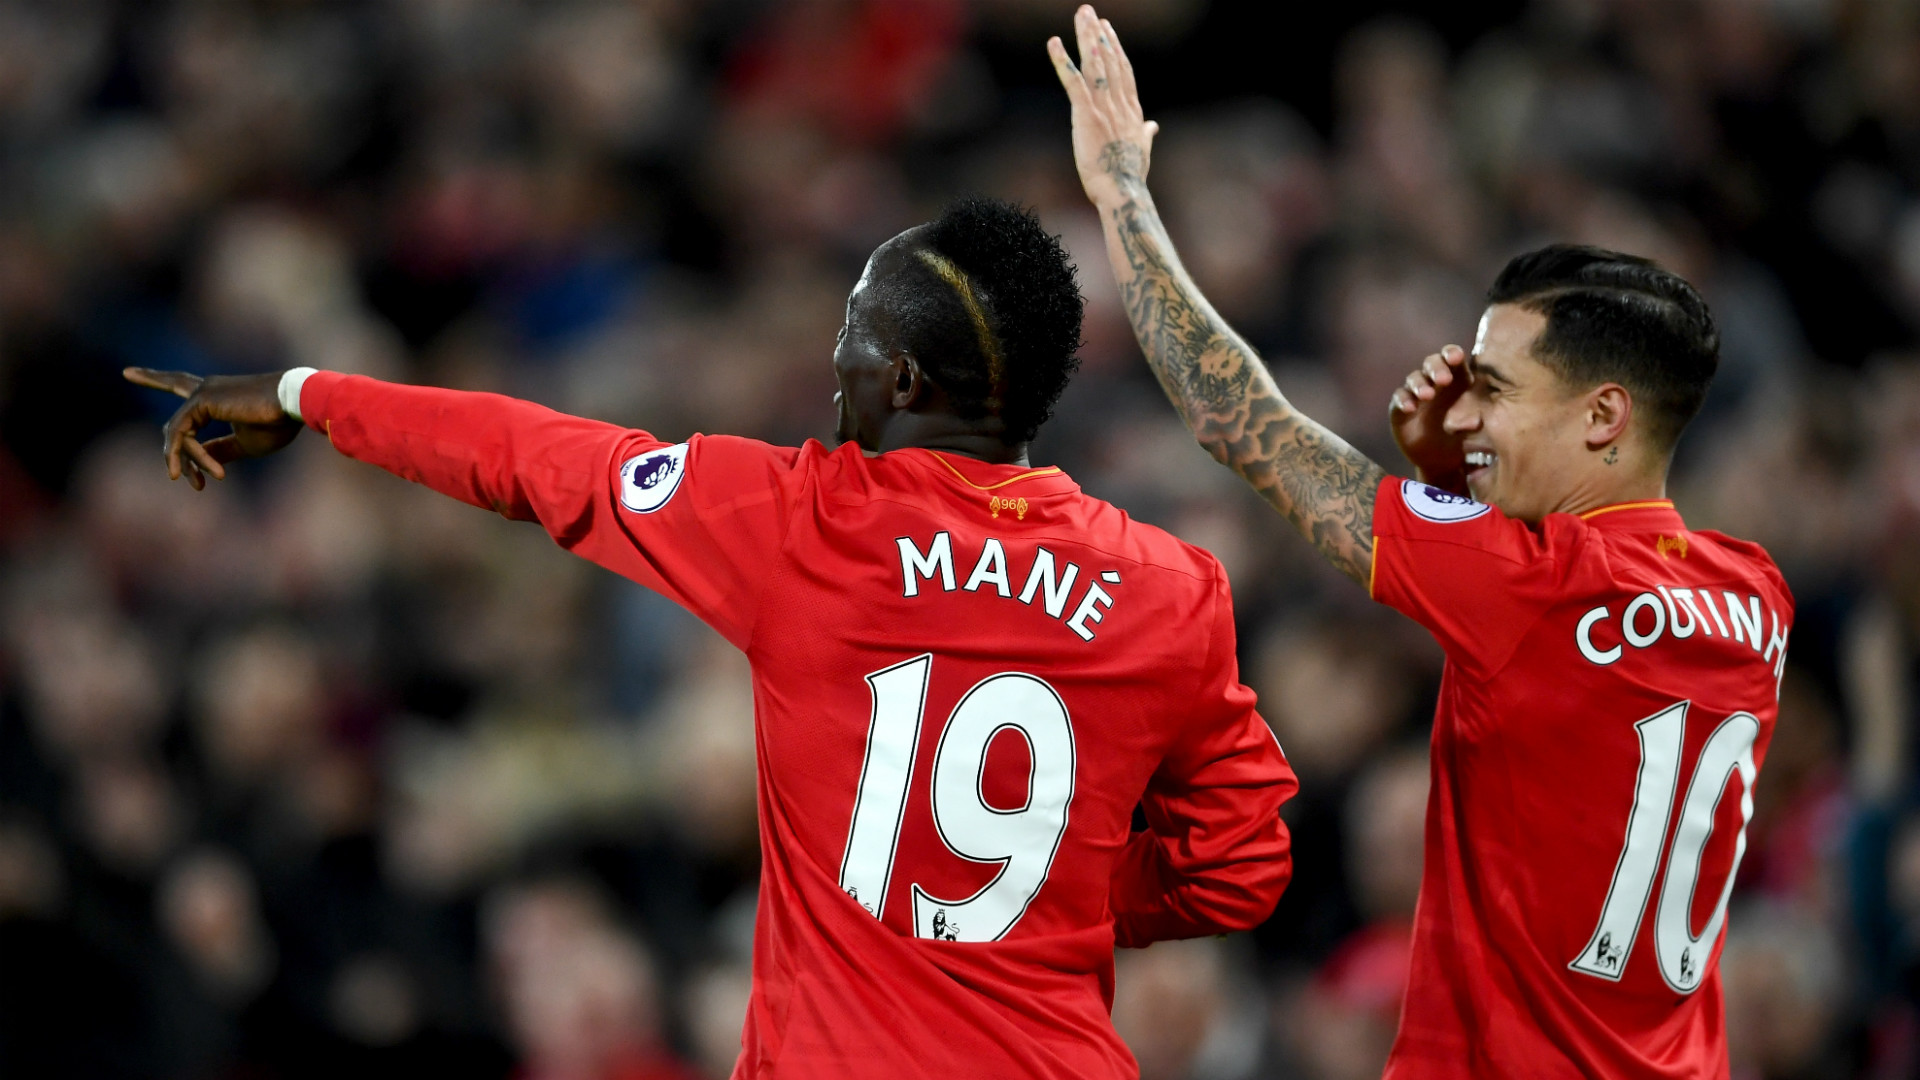 HD Sadio Mane Phil Coutinho Liverpool celebrate